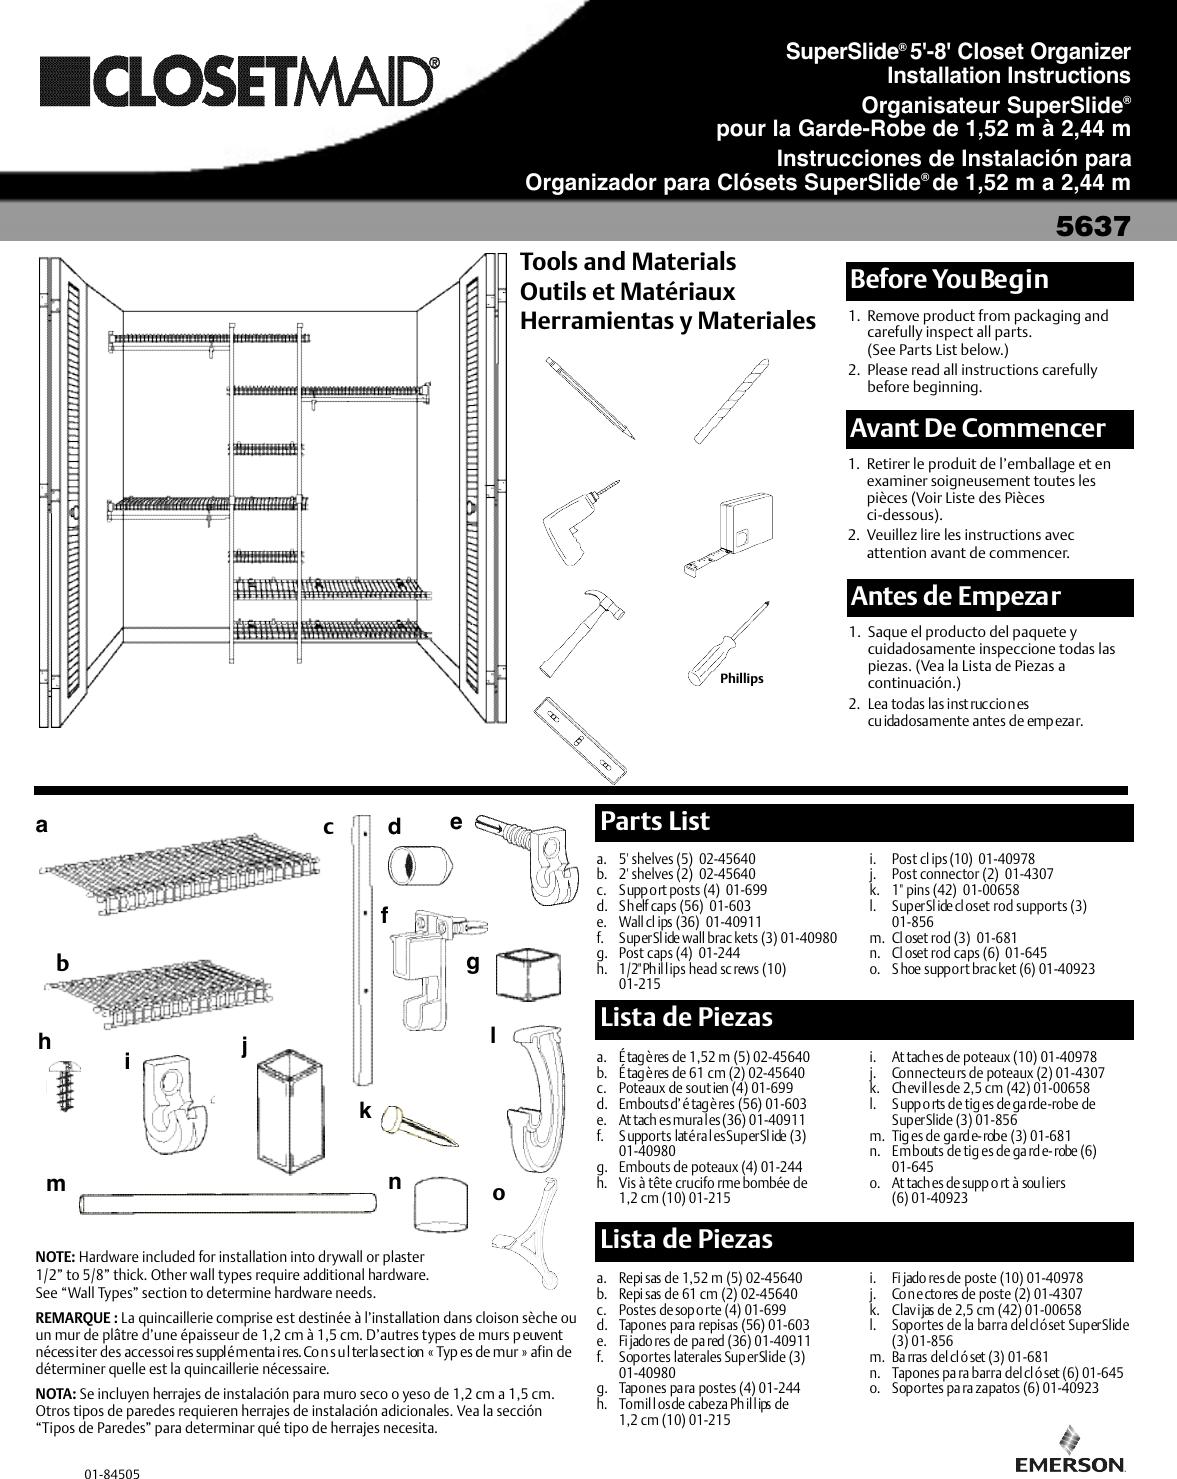 Emerson Super 5637 Instruction Booklet